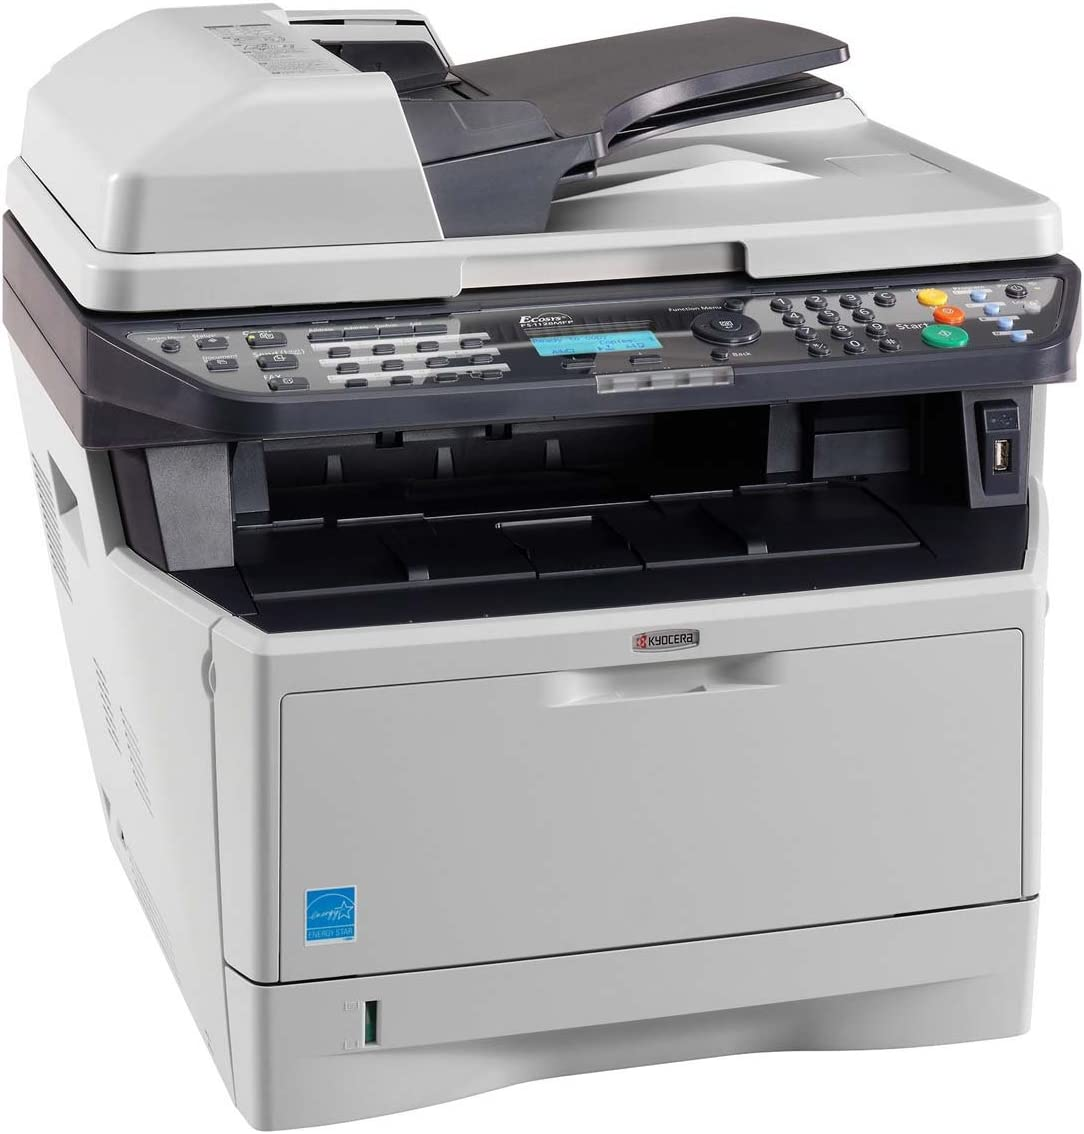 Kyocera FS-1128MFP - Impresora multifunción (Laser, Mono, Mono, 28 ...